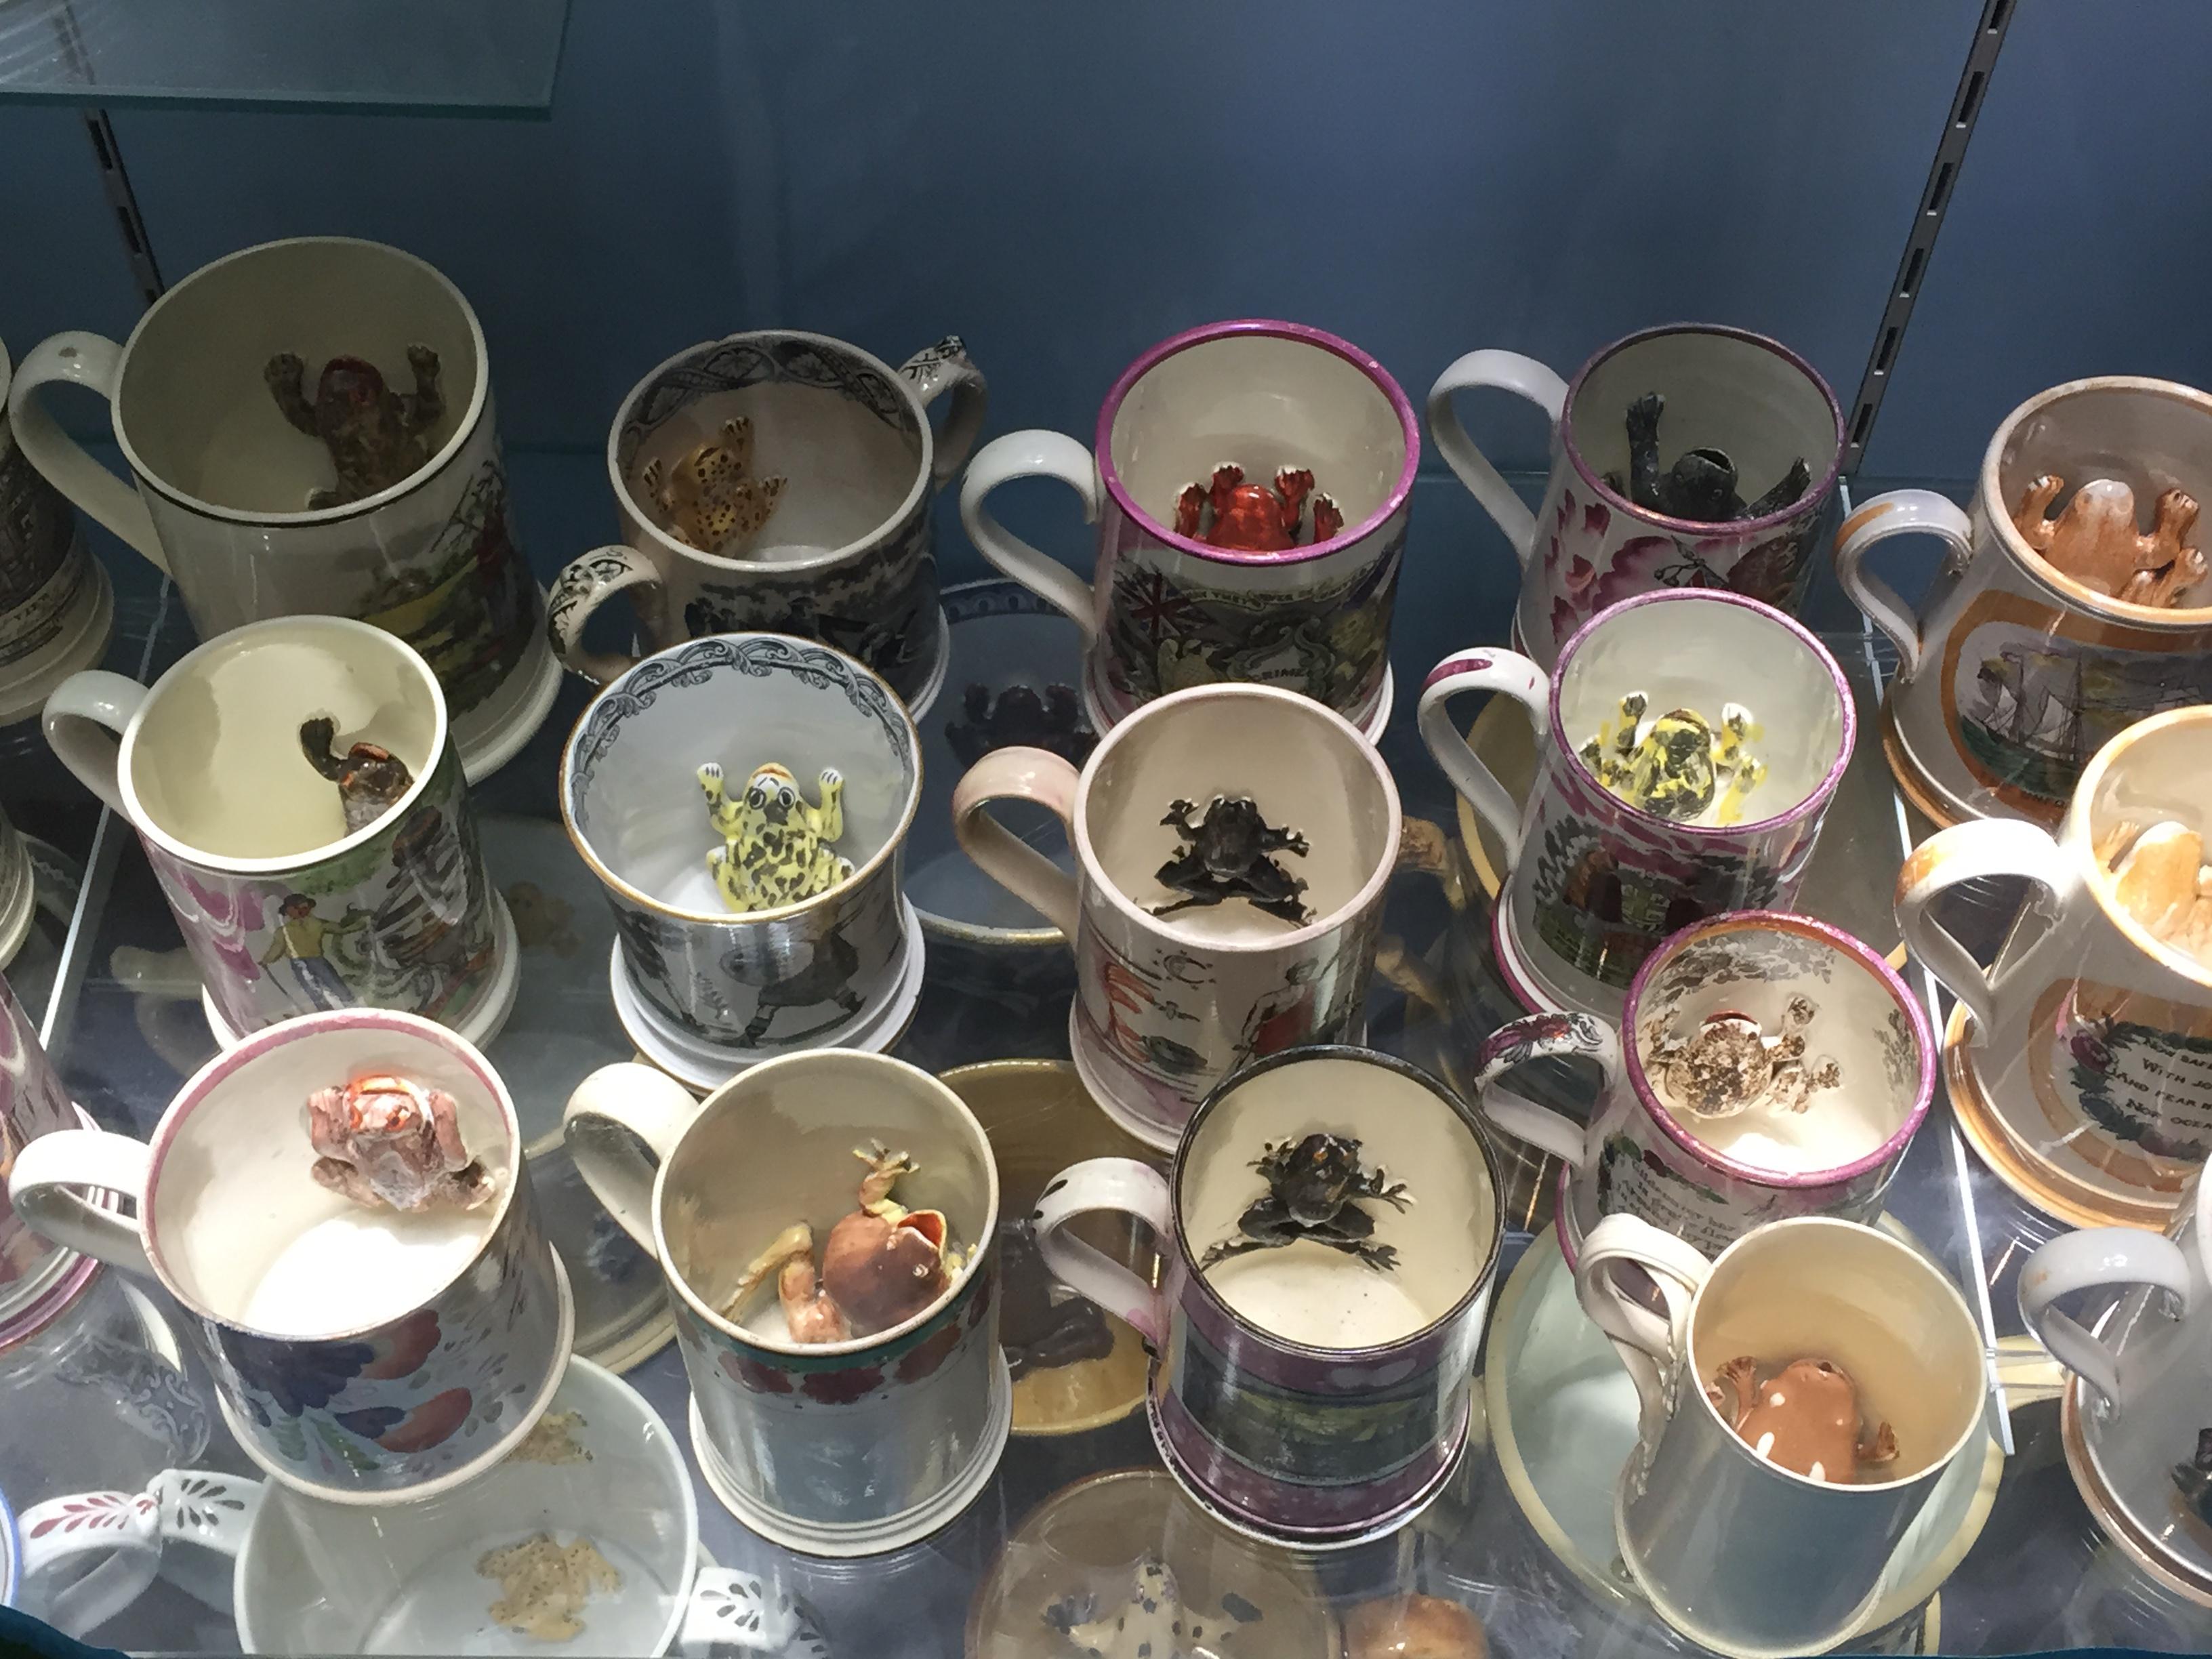 Davies Collection of Frog Mugs